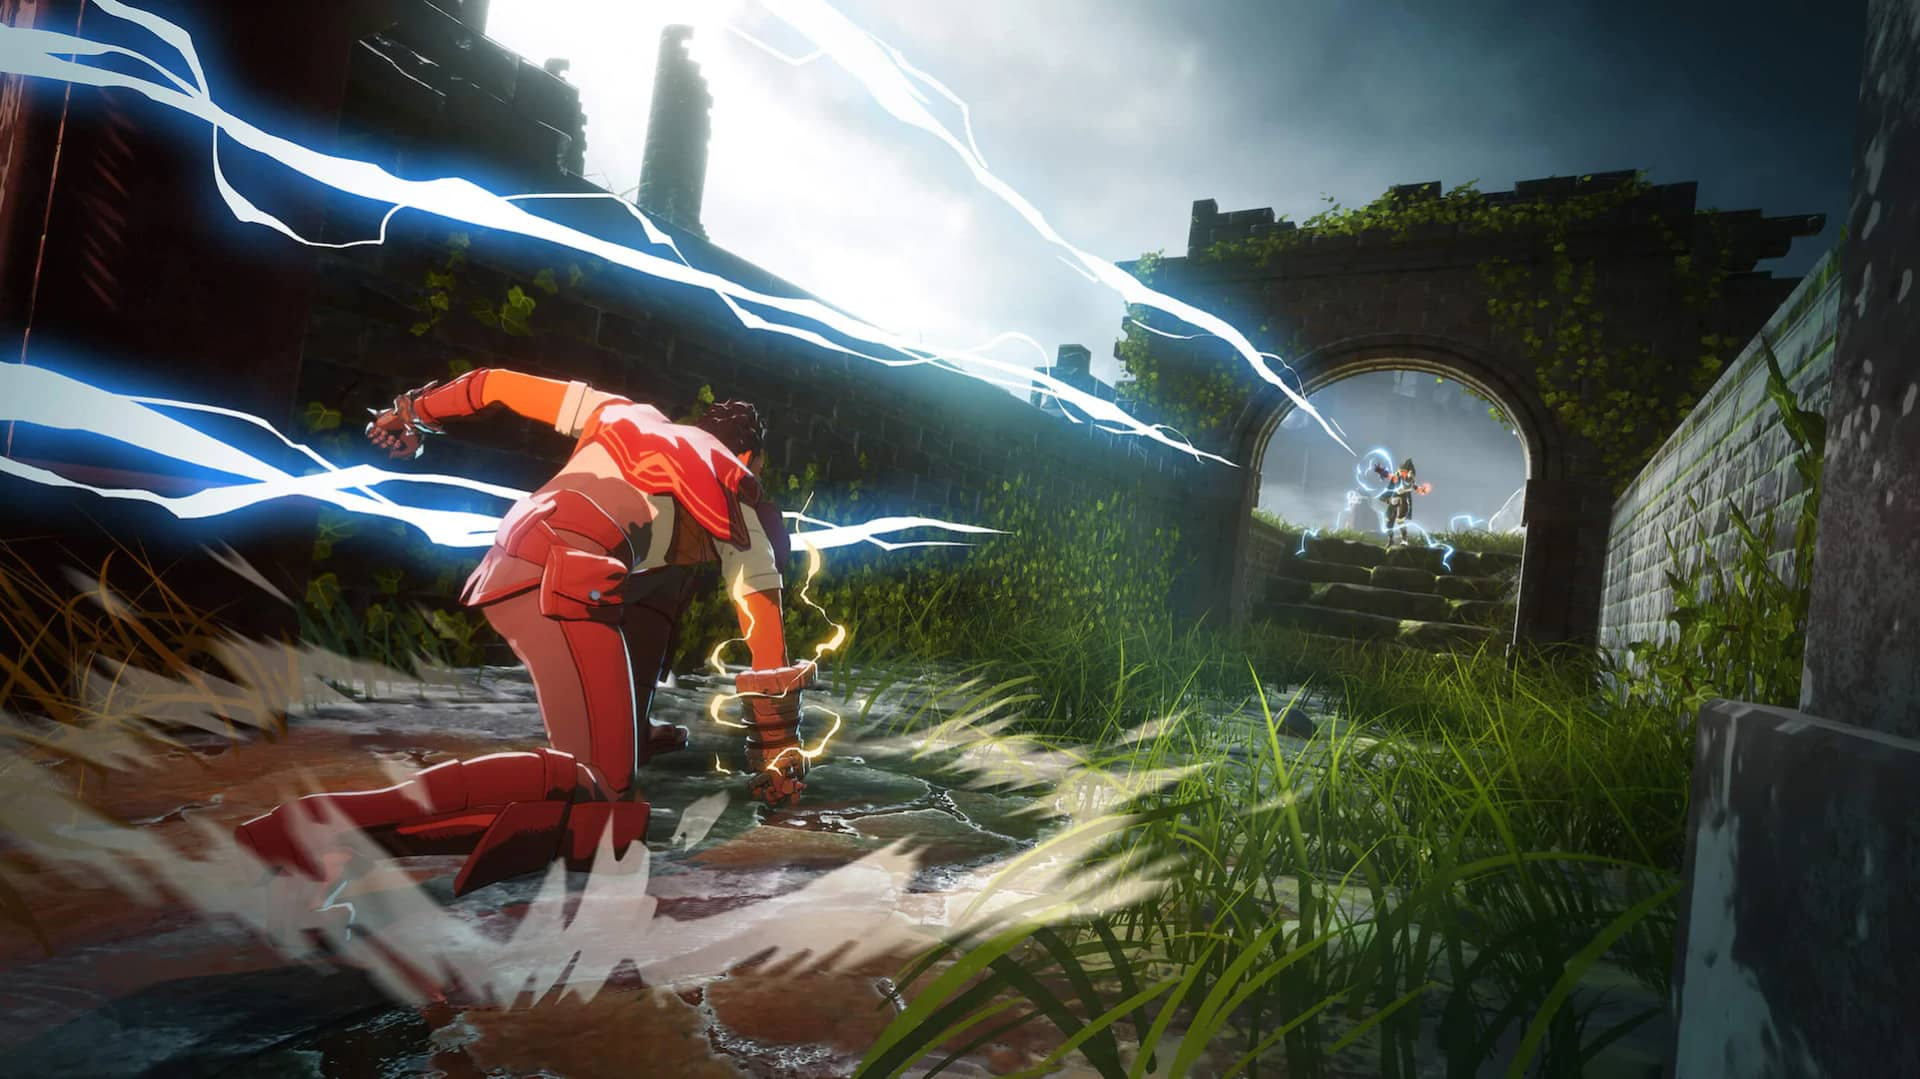 Spellbreak magic battle royale evolution future like Avatar: The Last Airbender with elemental magic